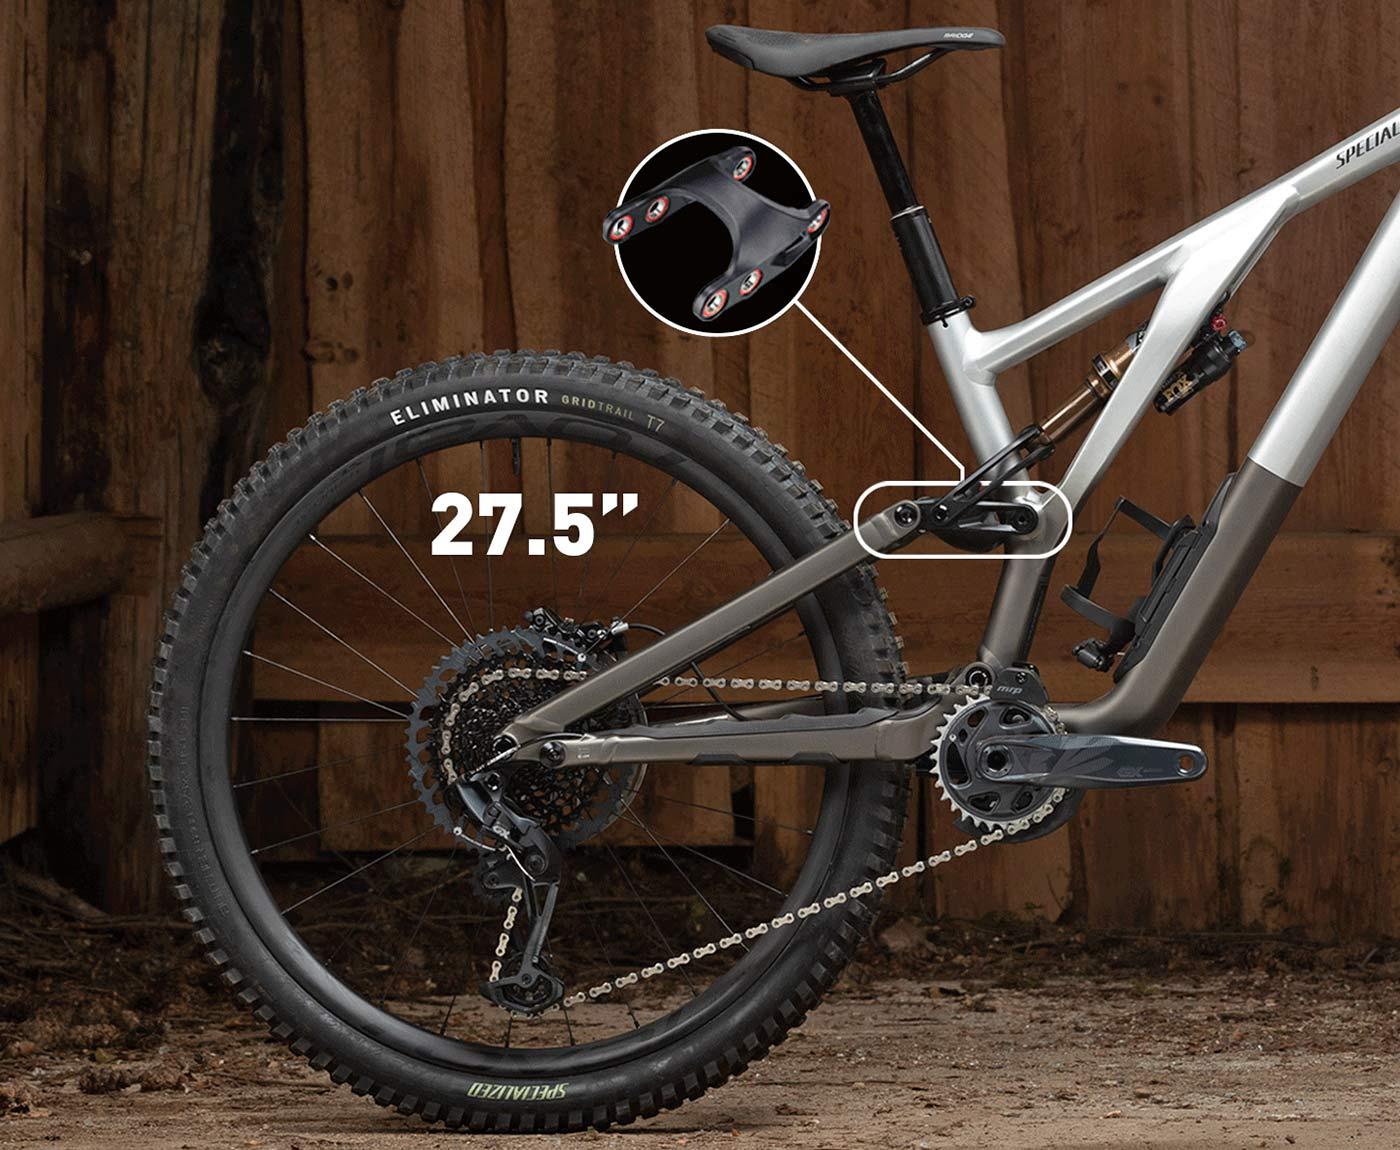 2022 Specialized Stumpjumper EVO Alloy trail bike, mulletlink